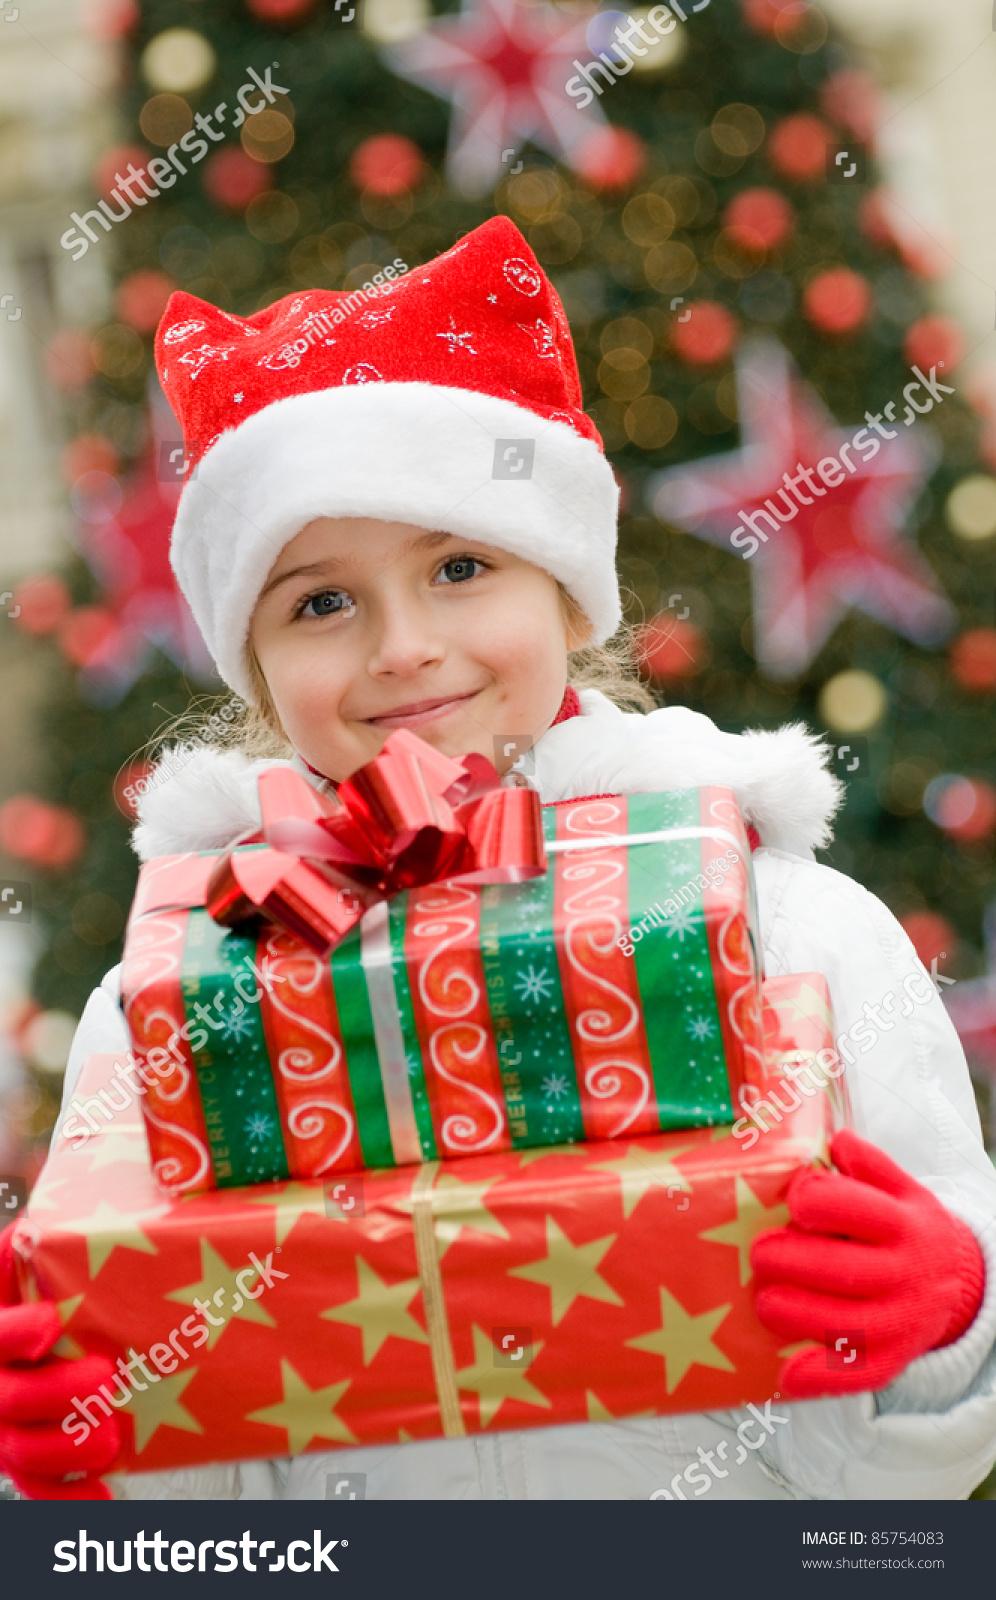 Happy Christmas Little Girl Christmas Gifts Stock Photo (Edit Now ...